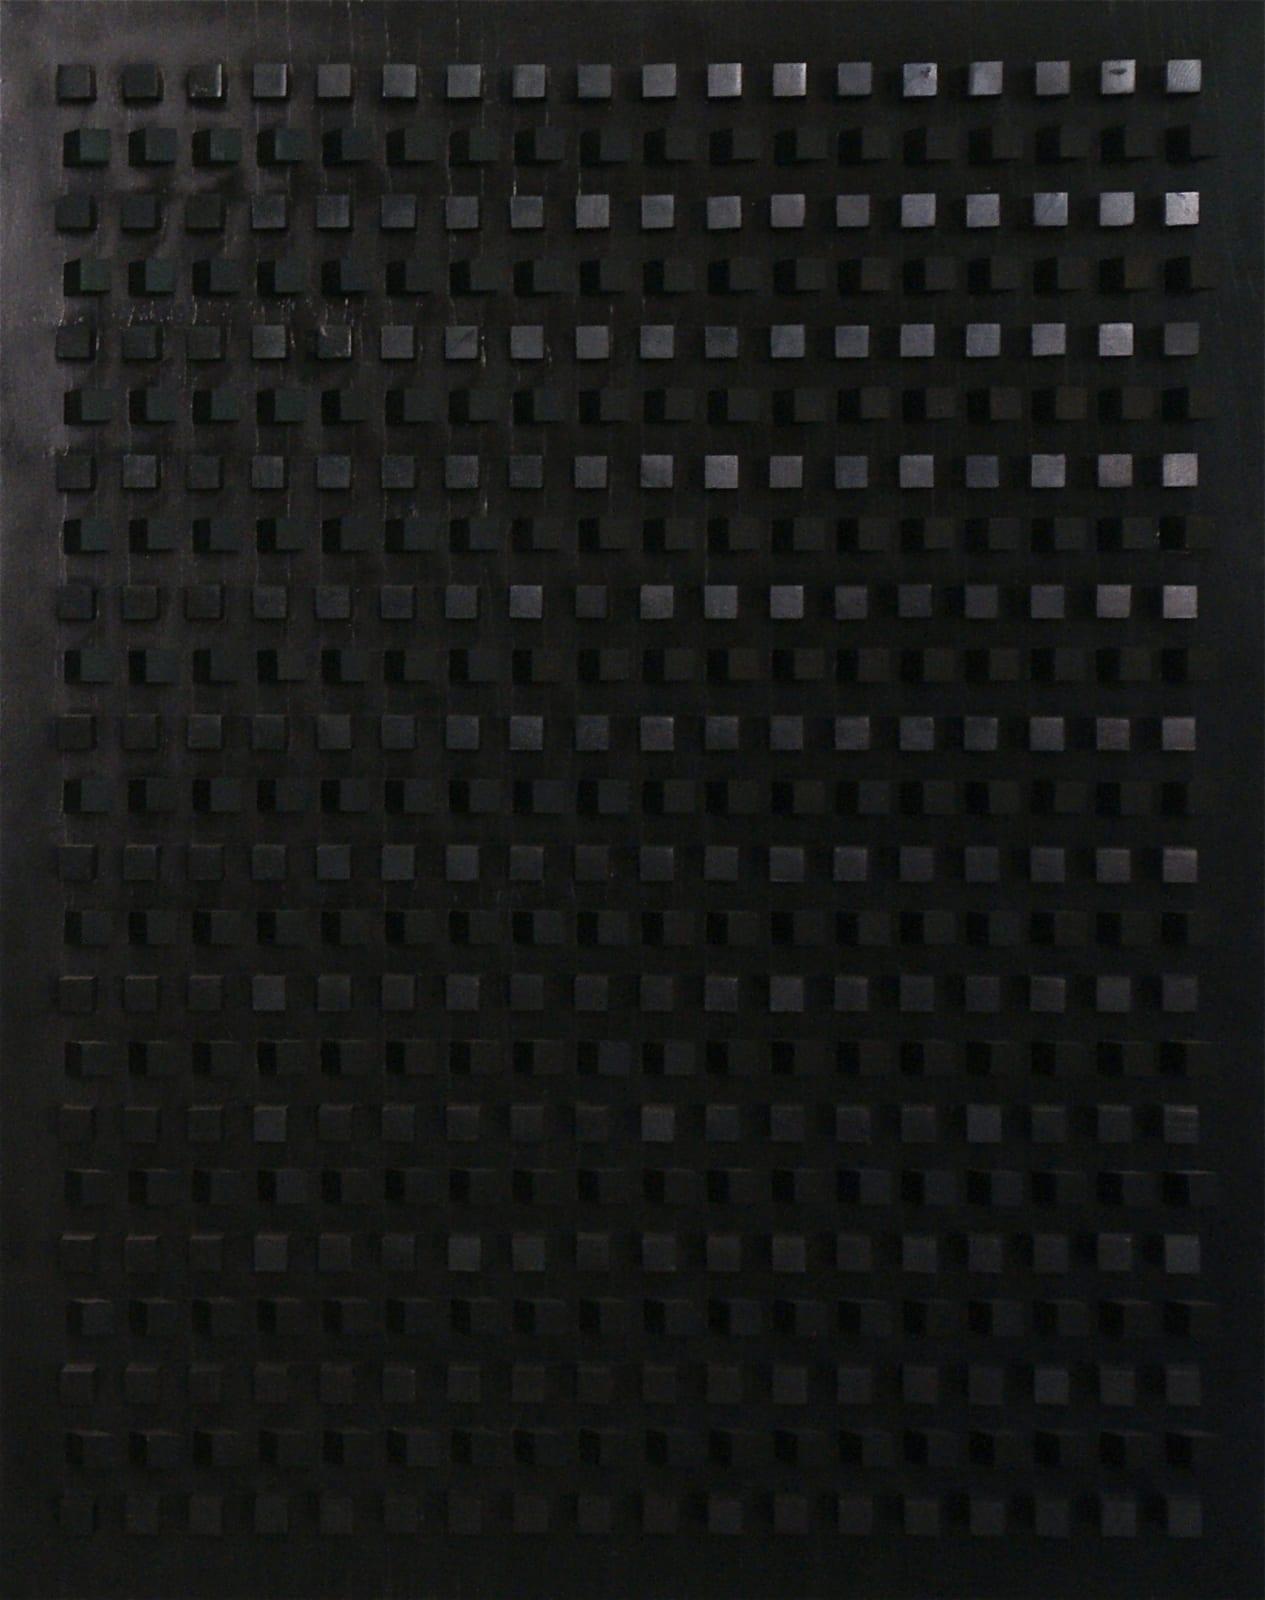 Dadamaino Untitled (Cromorilievo 11 gradi), 1974